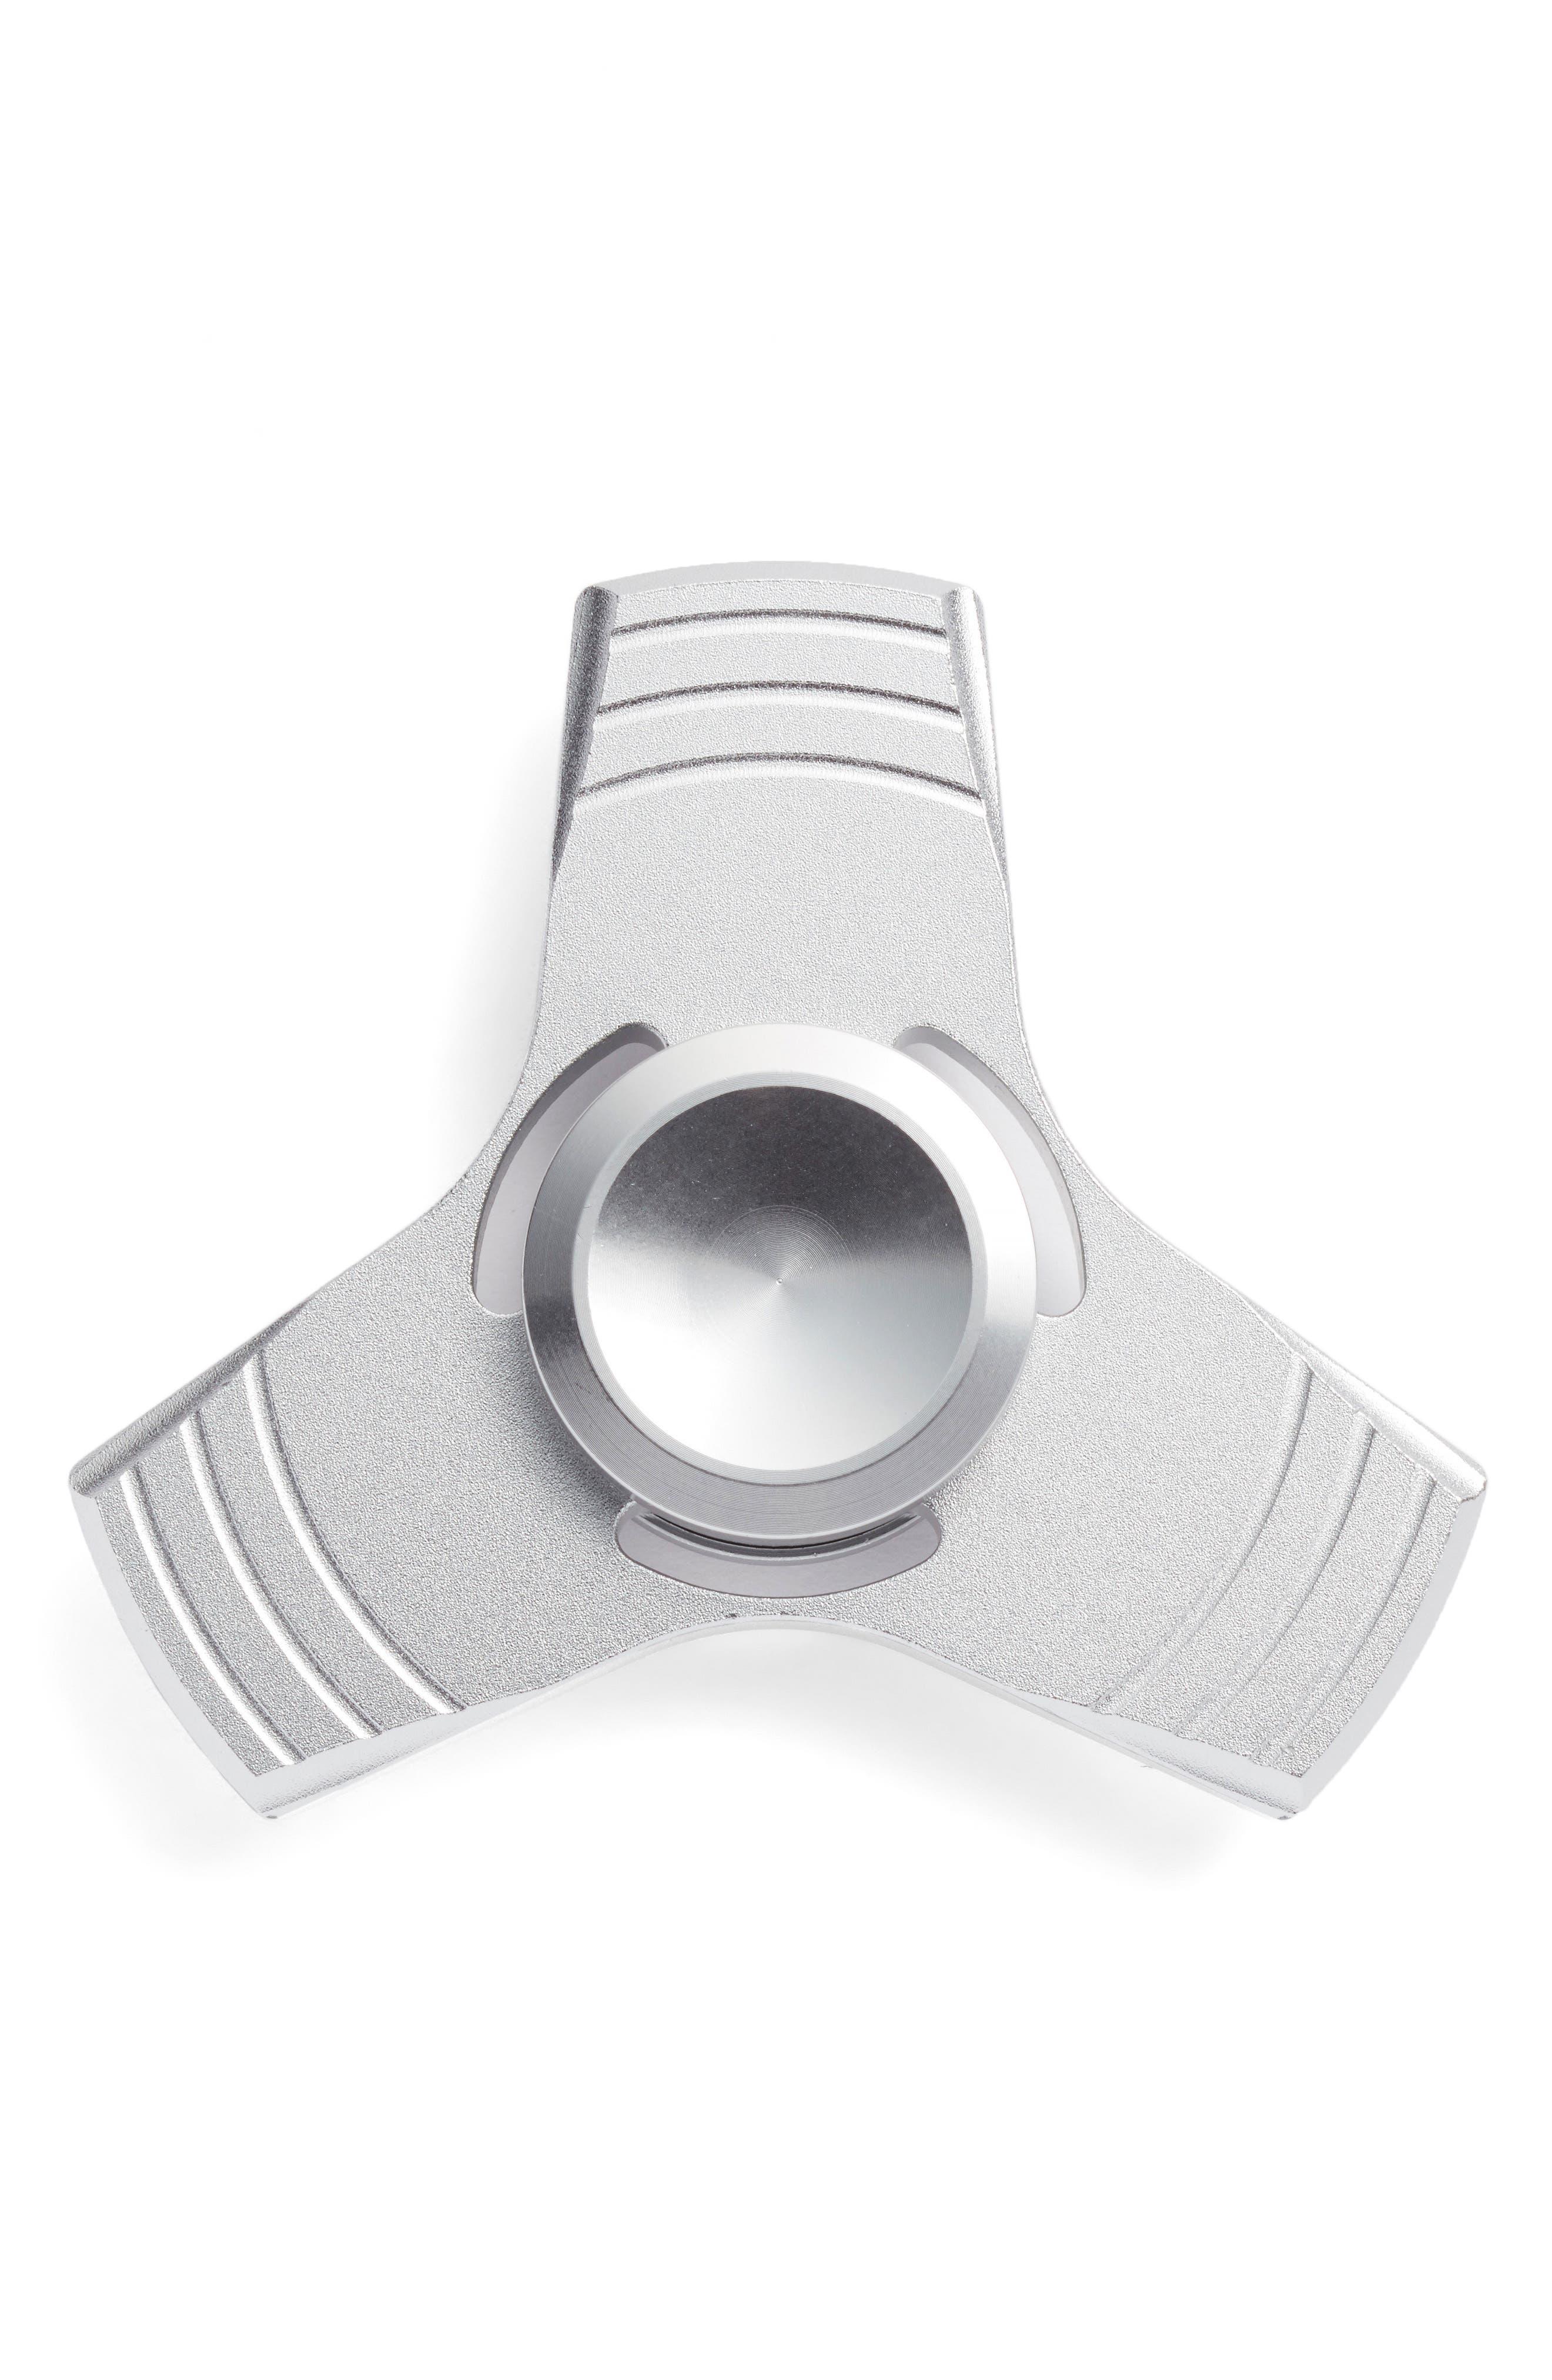 Addictive Fidget Spinners Propeller Tri Bar Fidget Toy